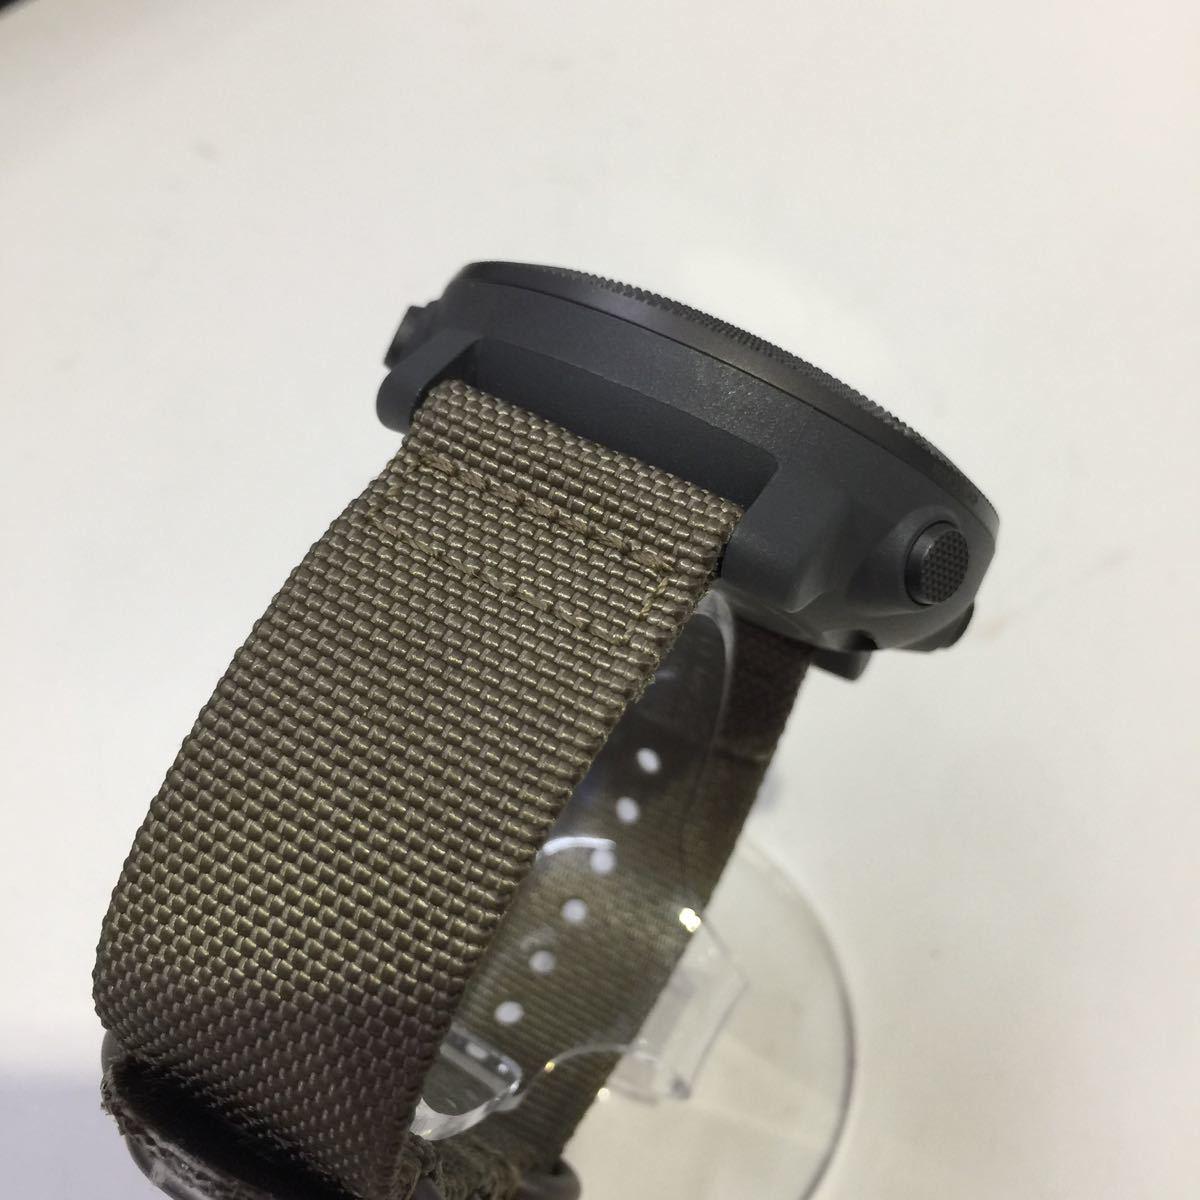 【SUUNTO スント】トラバースアルファフォリッジ TRAVERSE ALPHA FOLIAGE 腕時計 デジタル腕時計 デジタル アウトドアウォッチ アウトドア_画像6